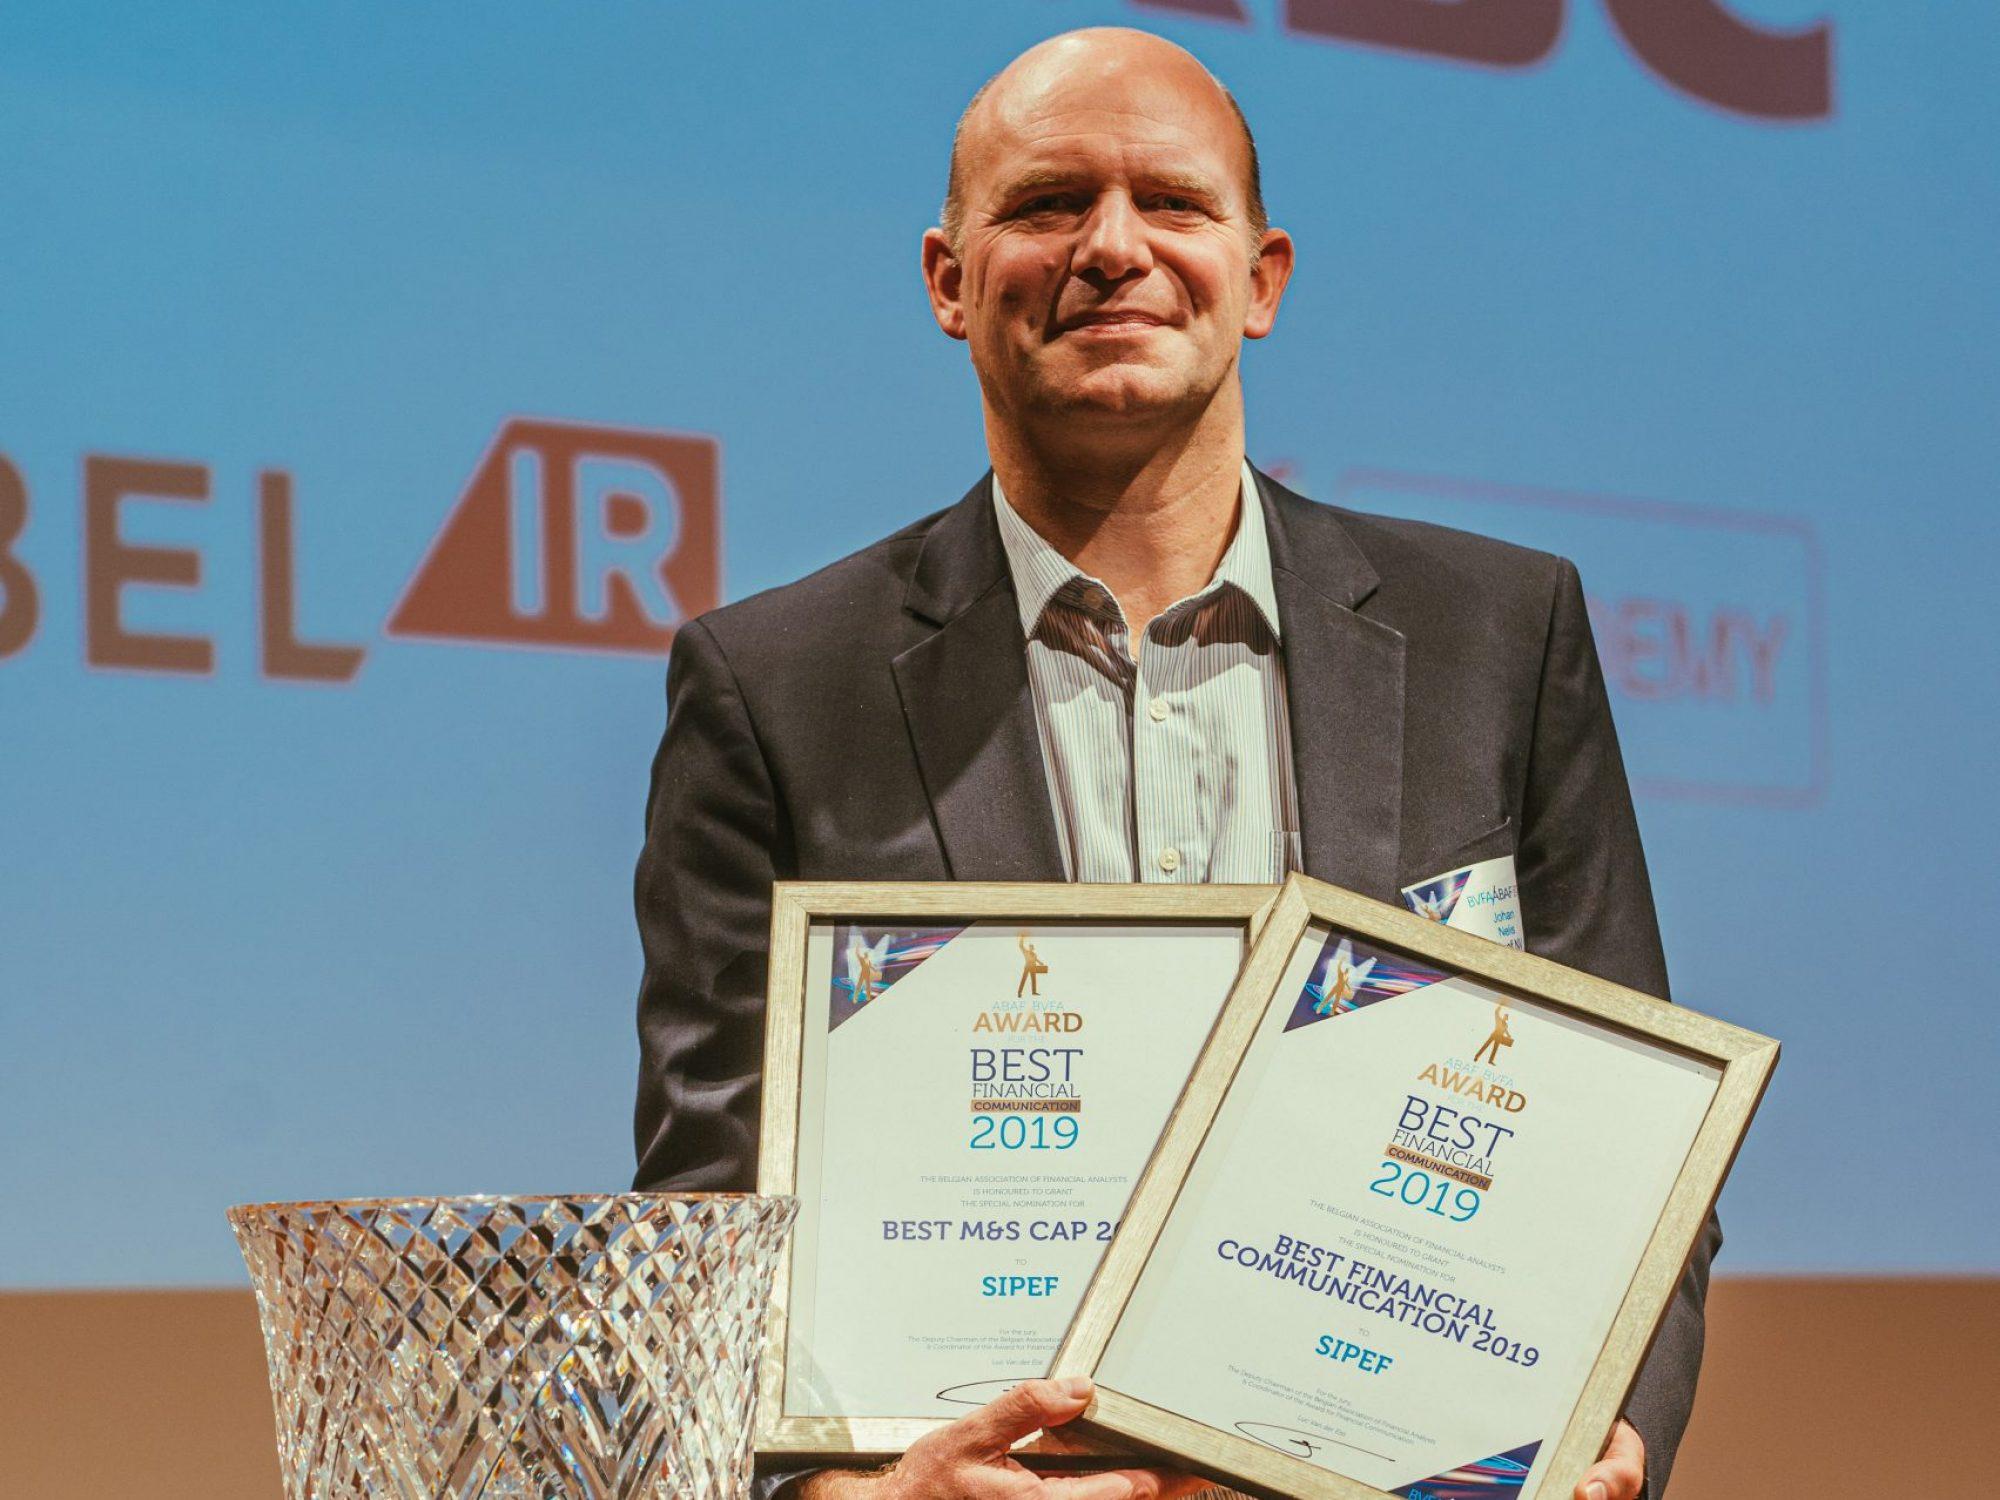 ABAF Awards Winner 2019 - Sipef